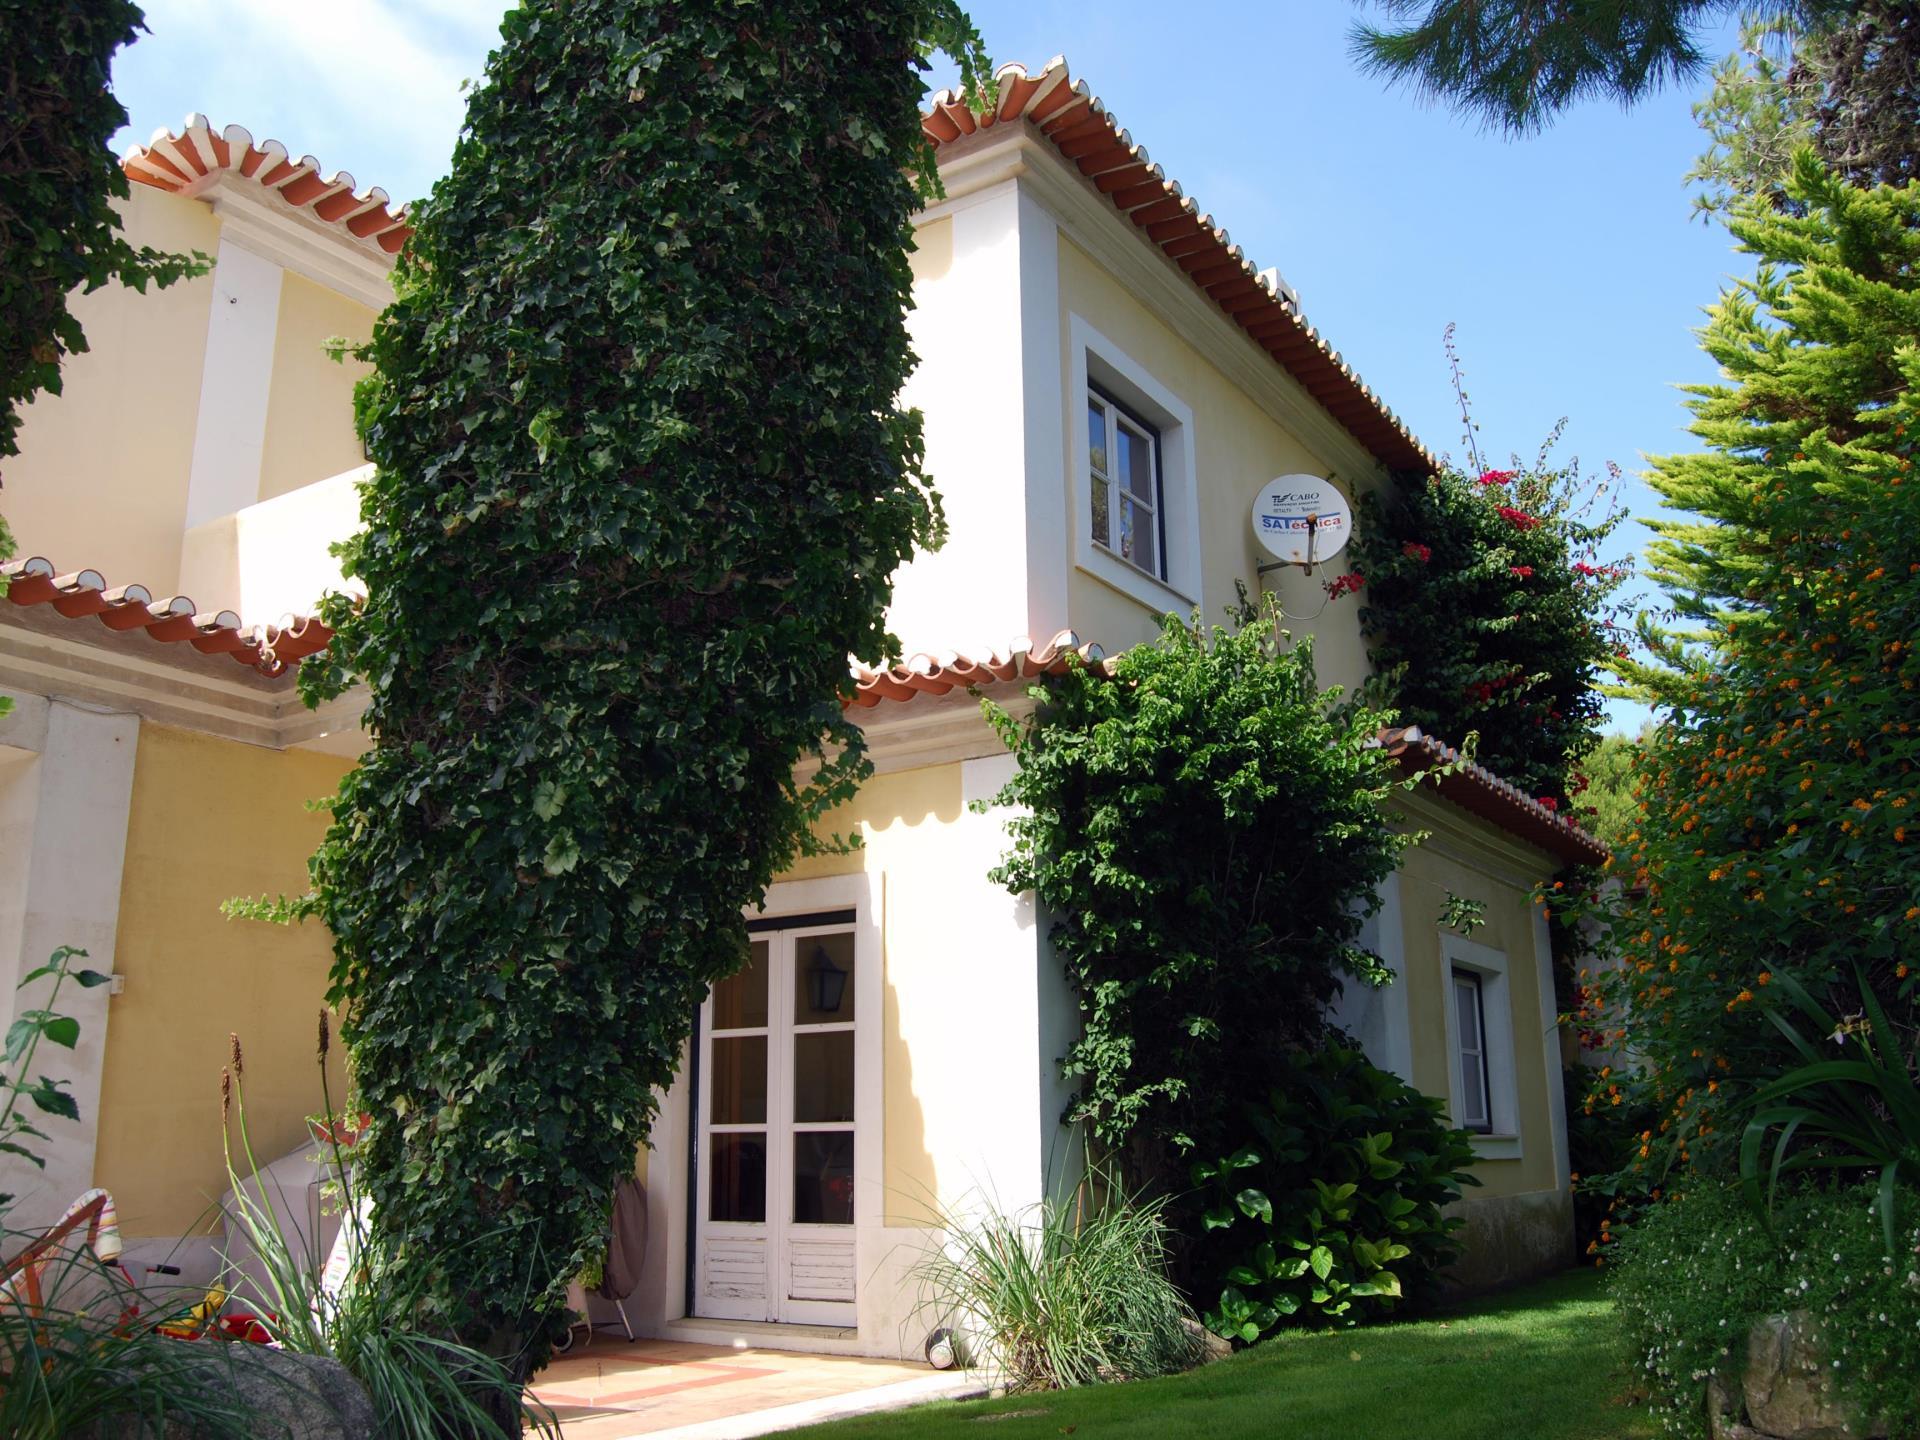 Villa per Vendita alle ore Detached house, 4 bedrooms, for Sale Areia, Cascais, Lisbona Portogallo